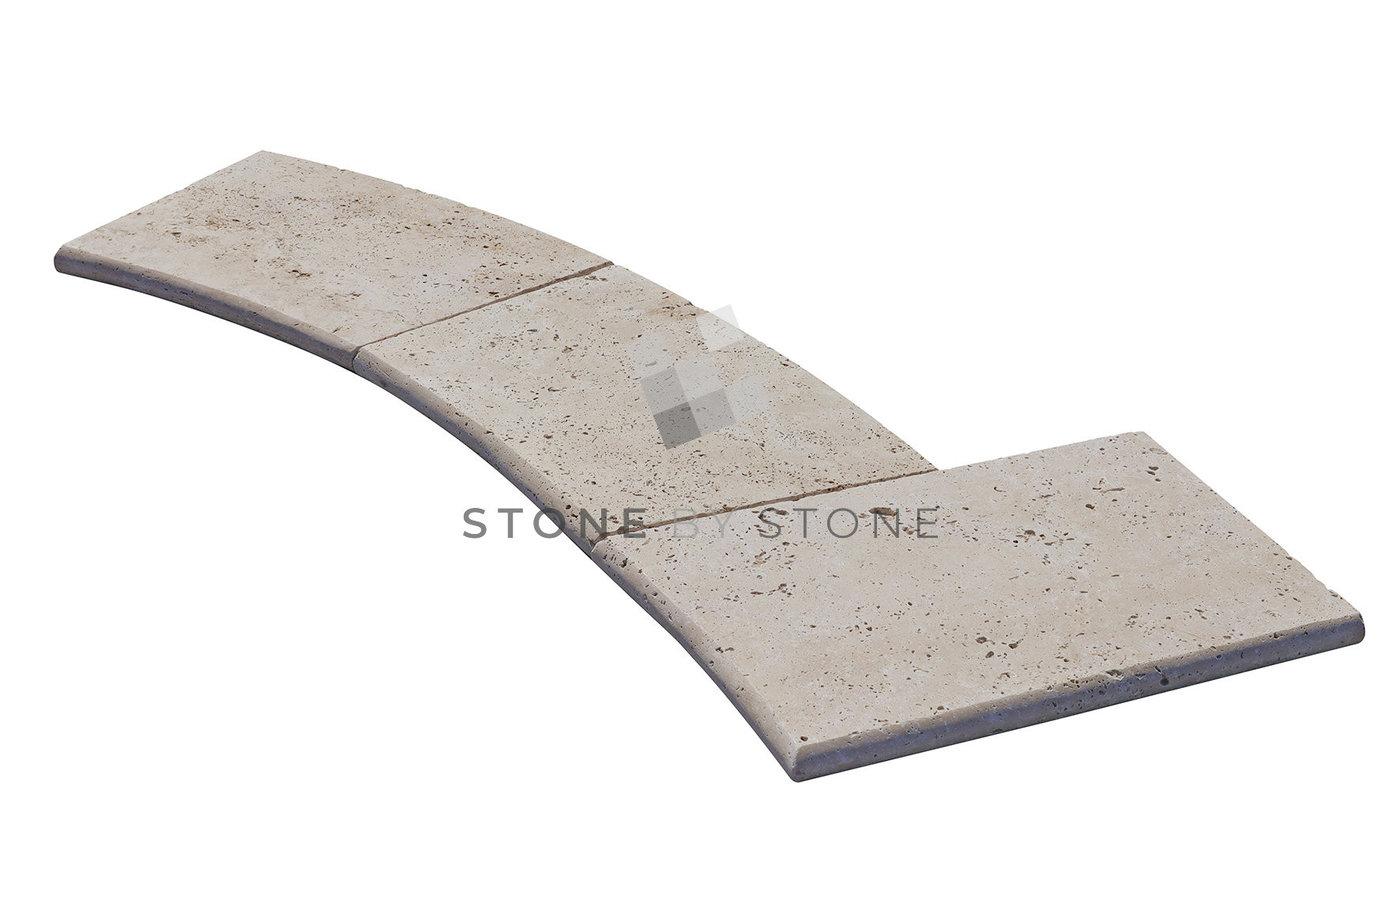 Bain Romain rayon 1,5m/3cm Bord demi rond - Travertin - Creme